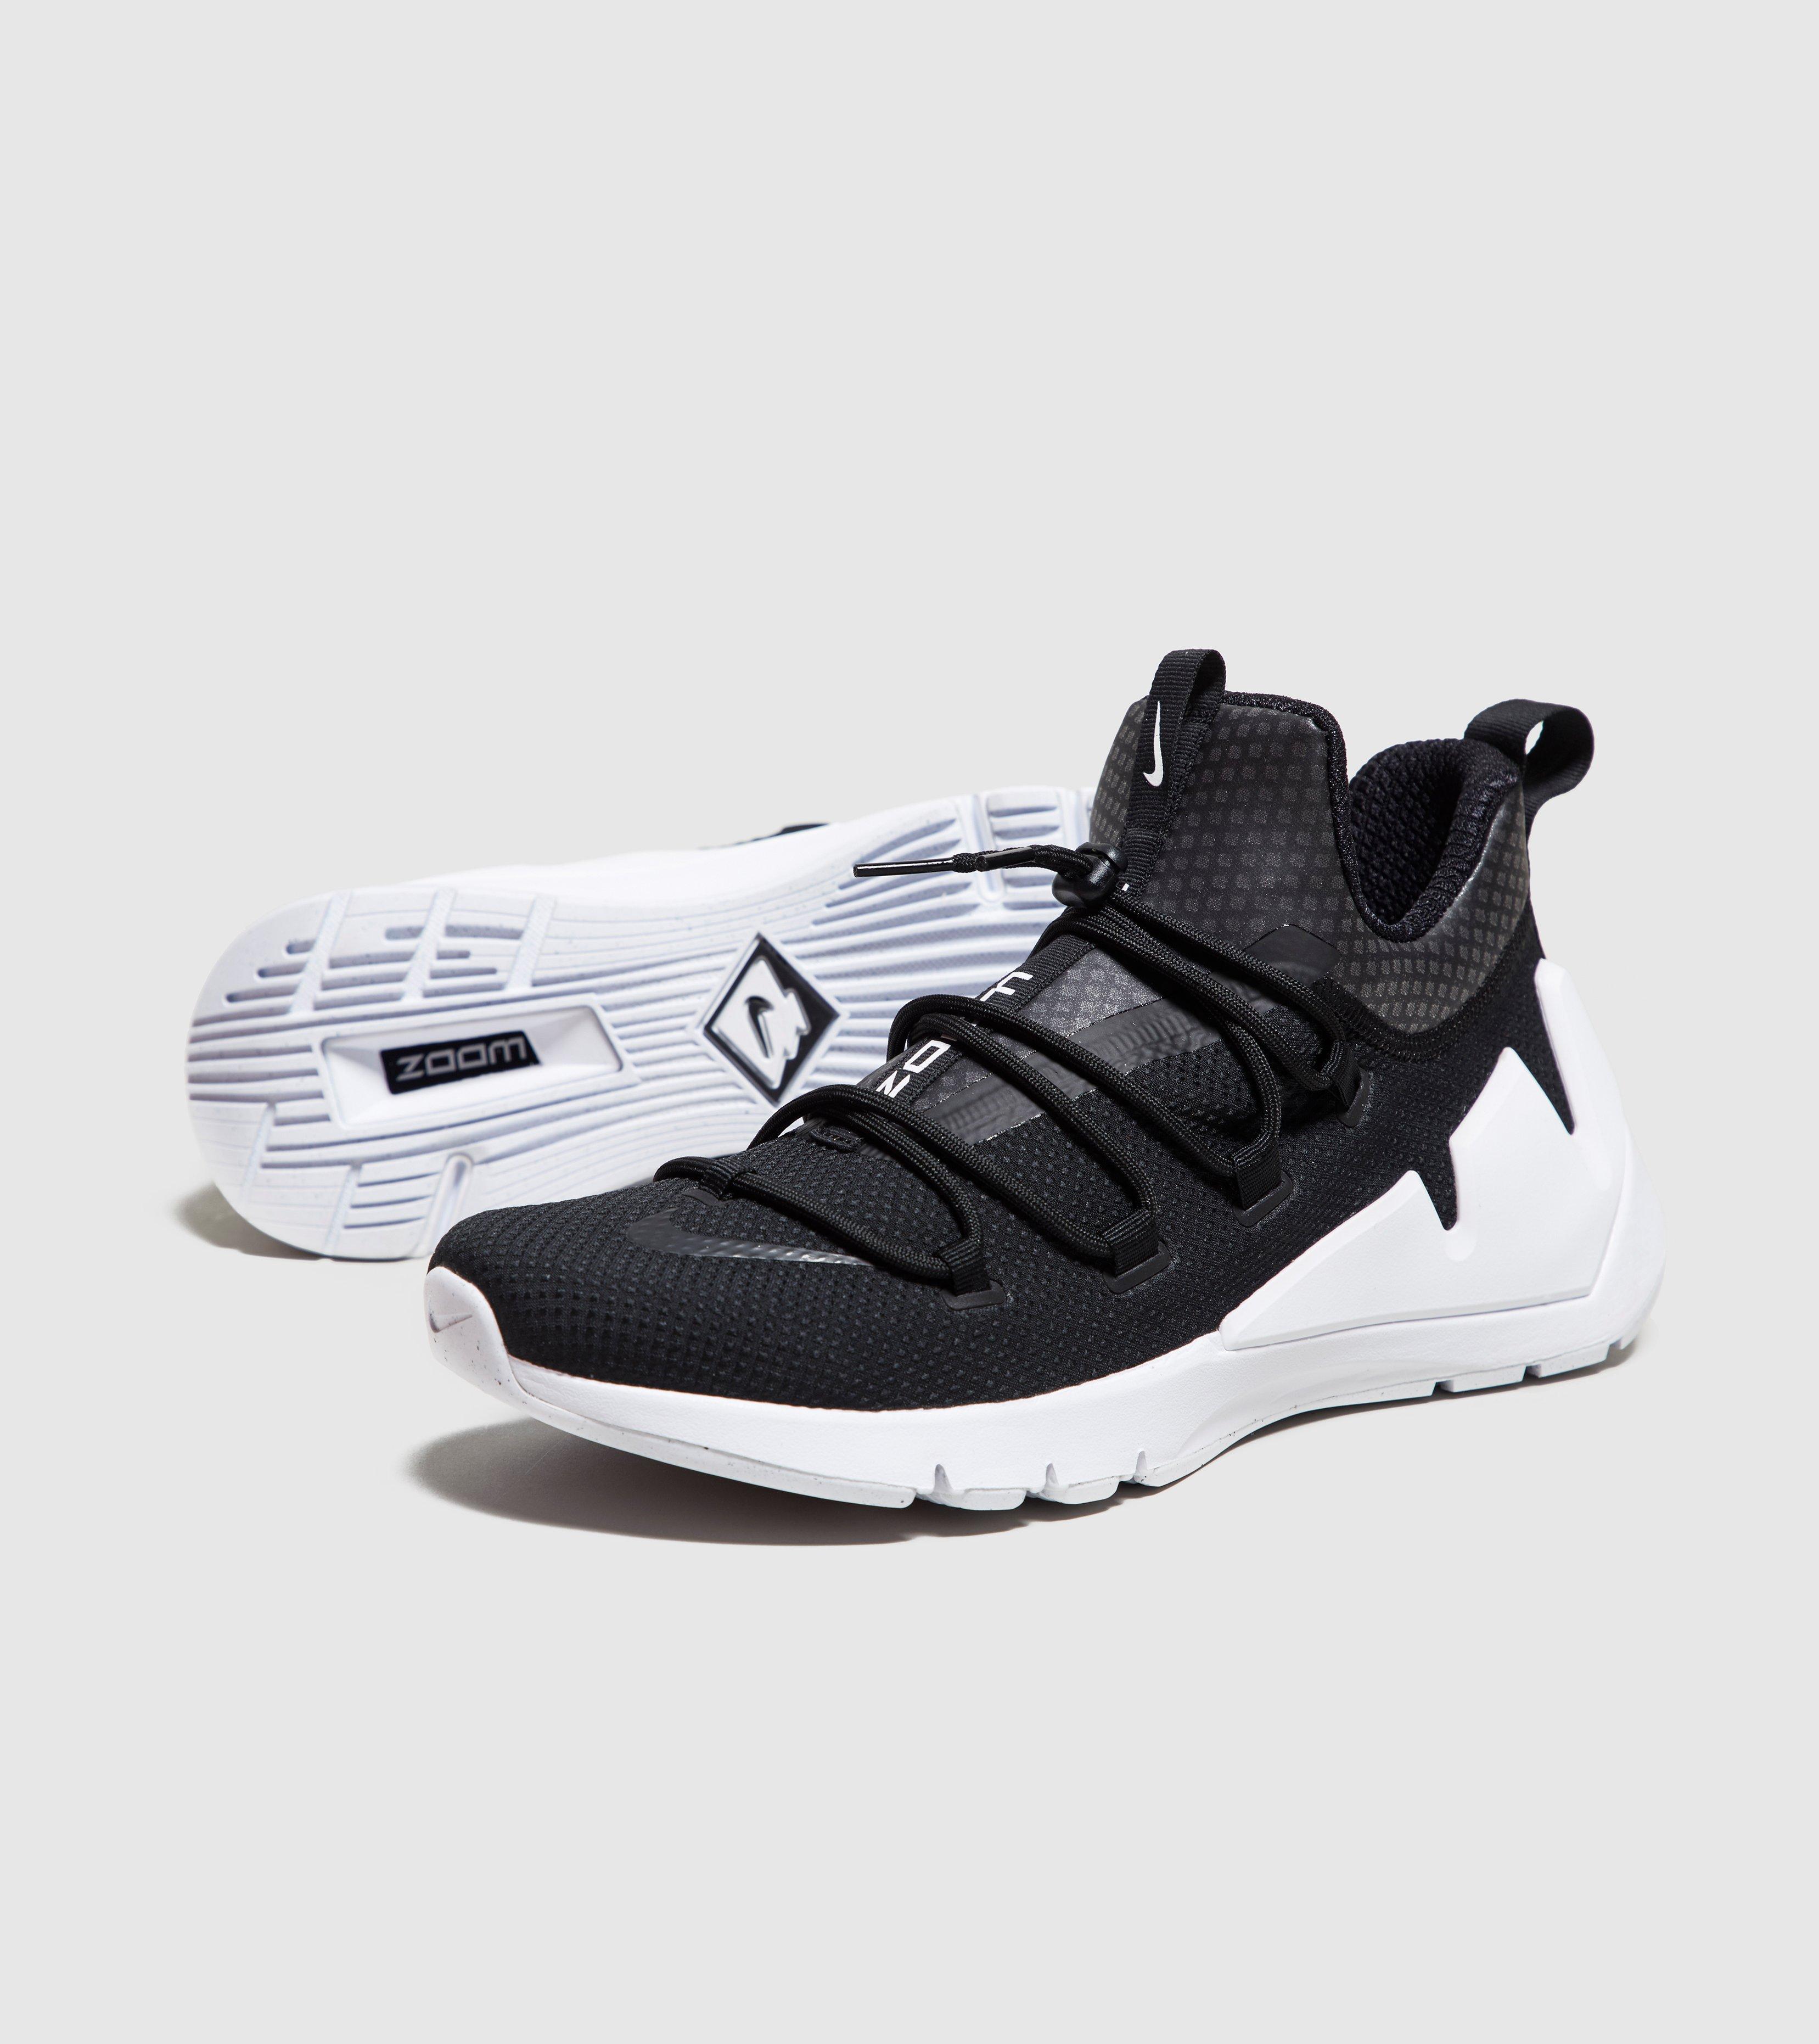 231bf7b90102 Nike Air Zoom Grade in Black for Men - Lyst